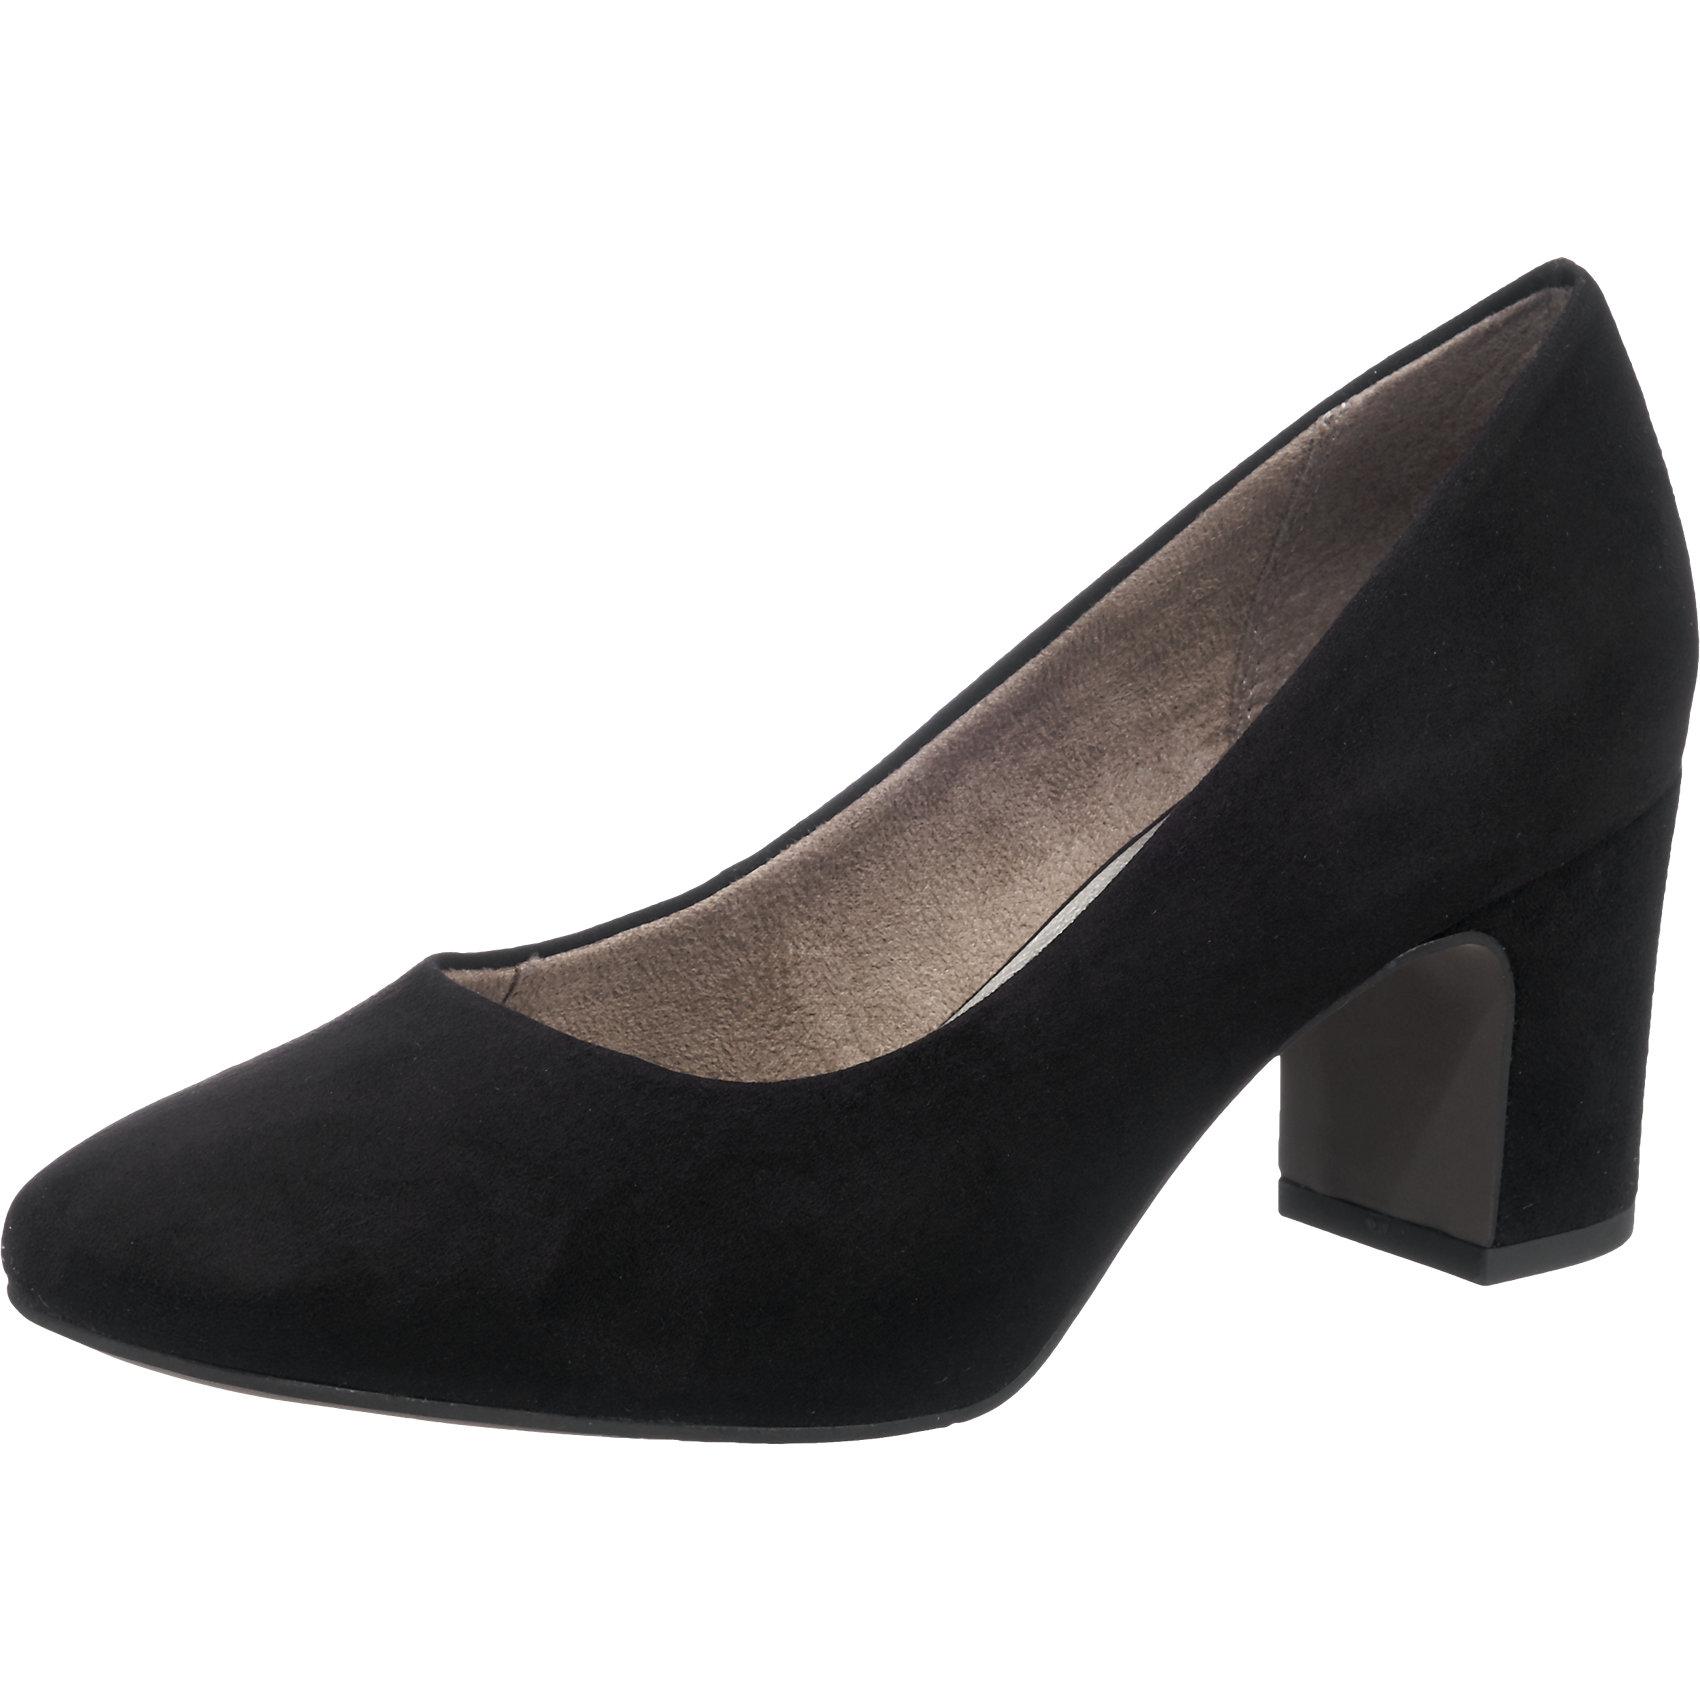 tamaris schuhe hamburg, Tamaris women's pumps shoes court